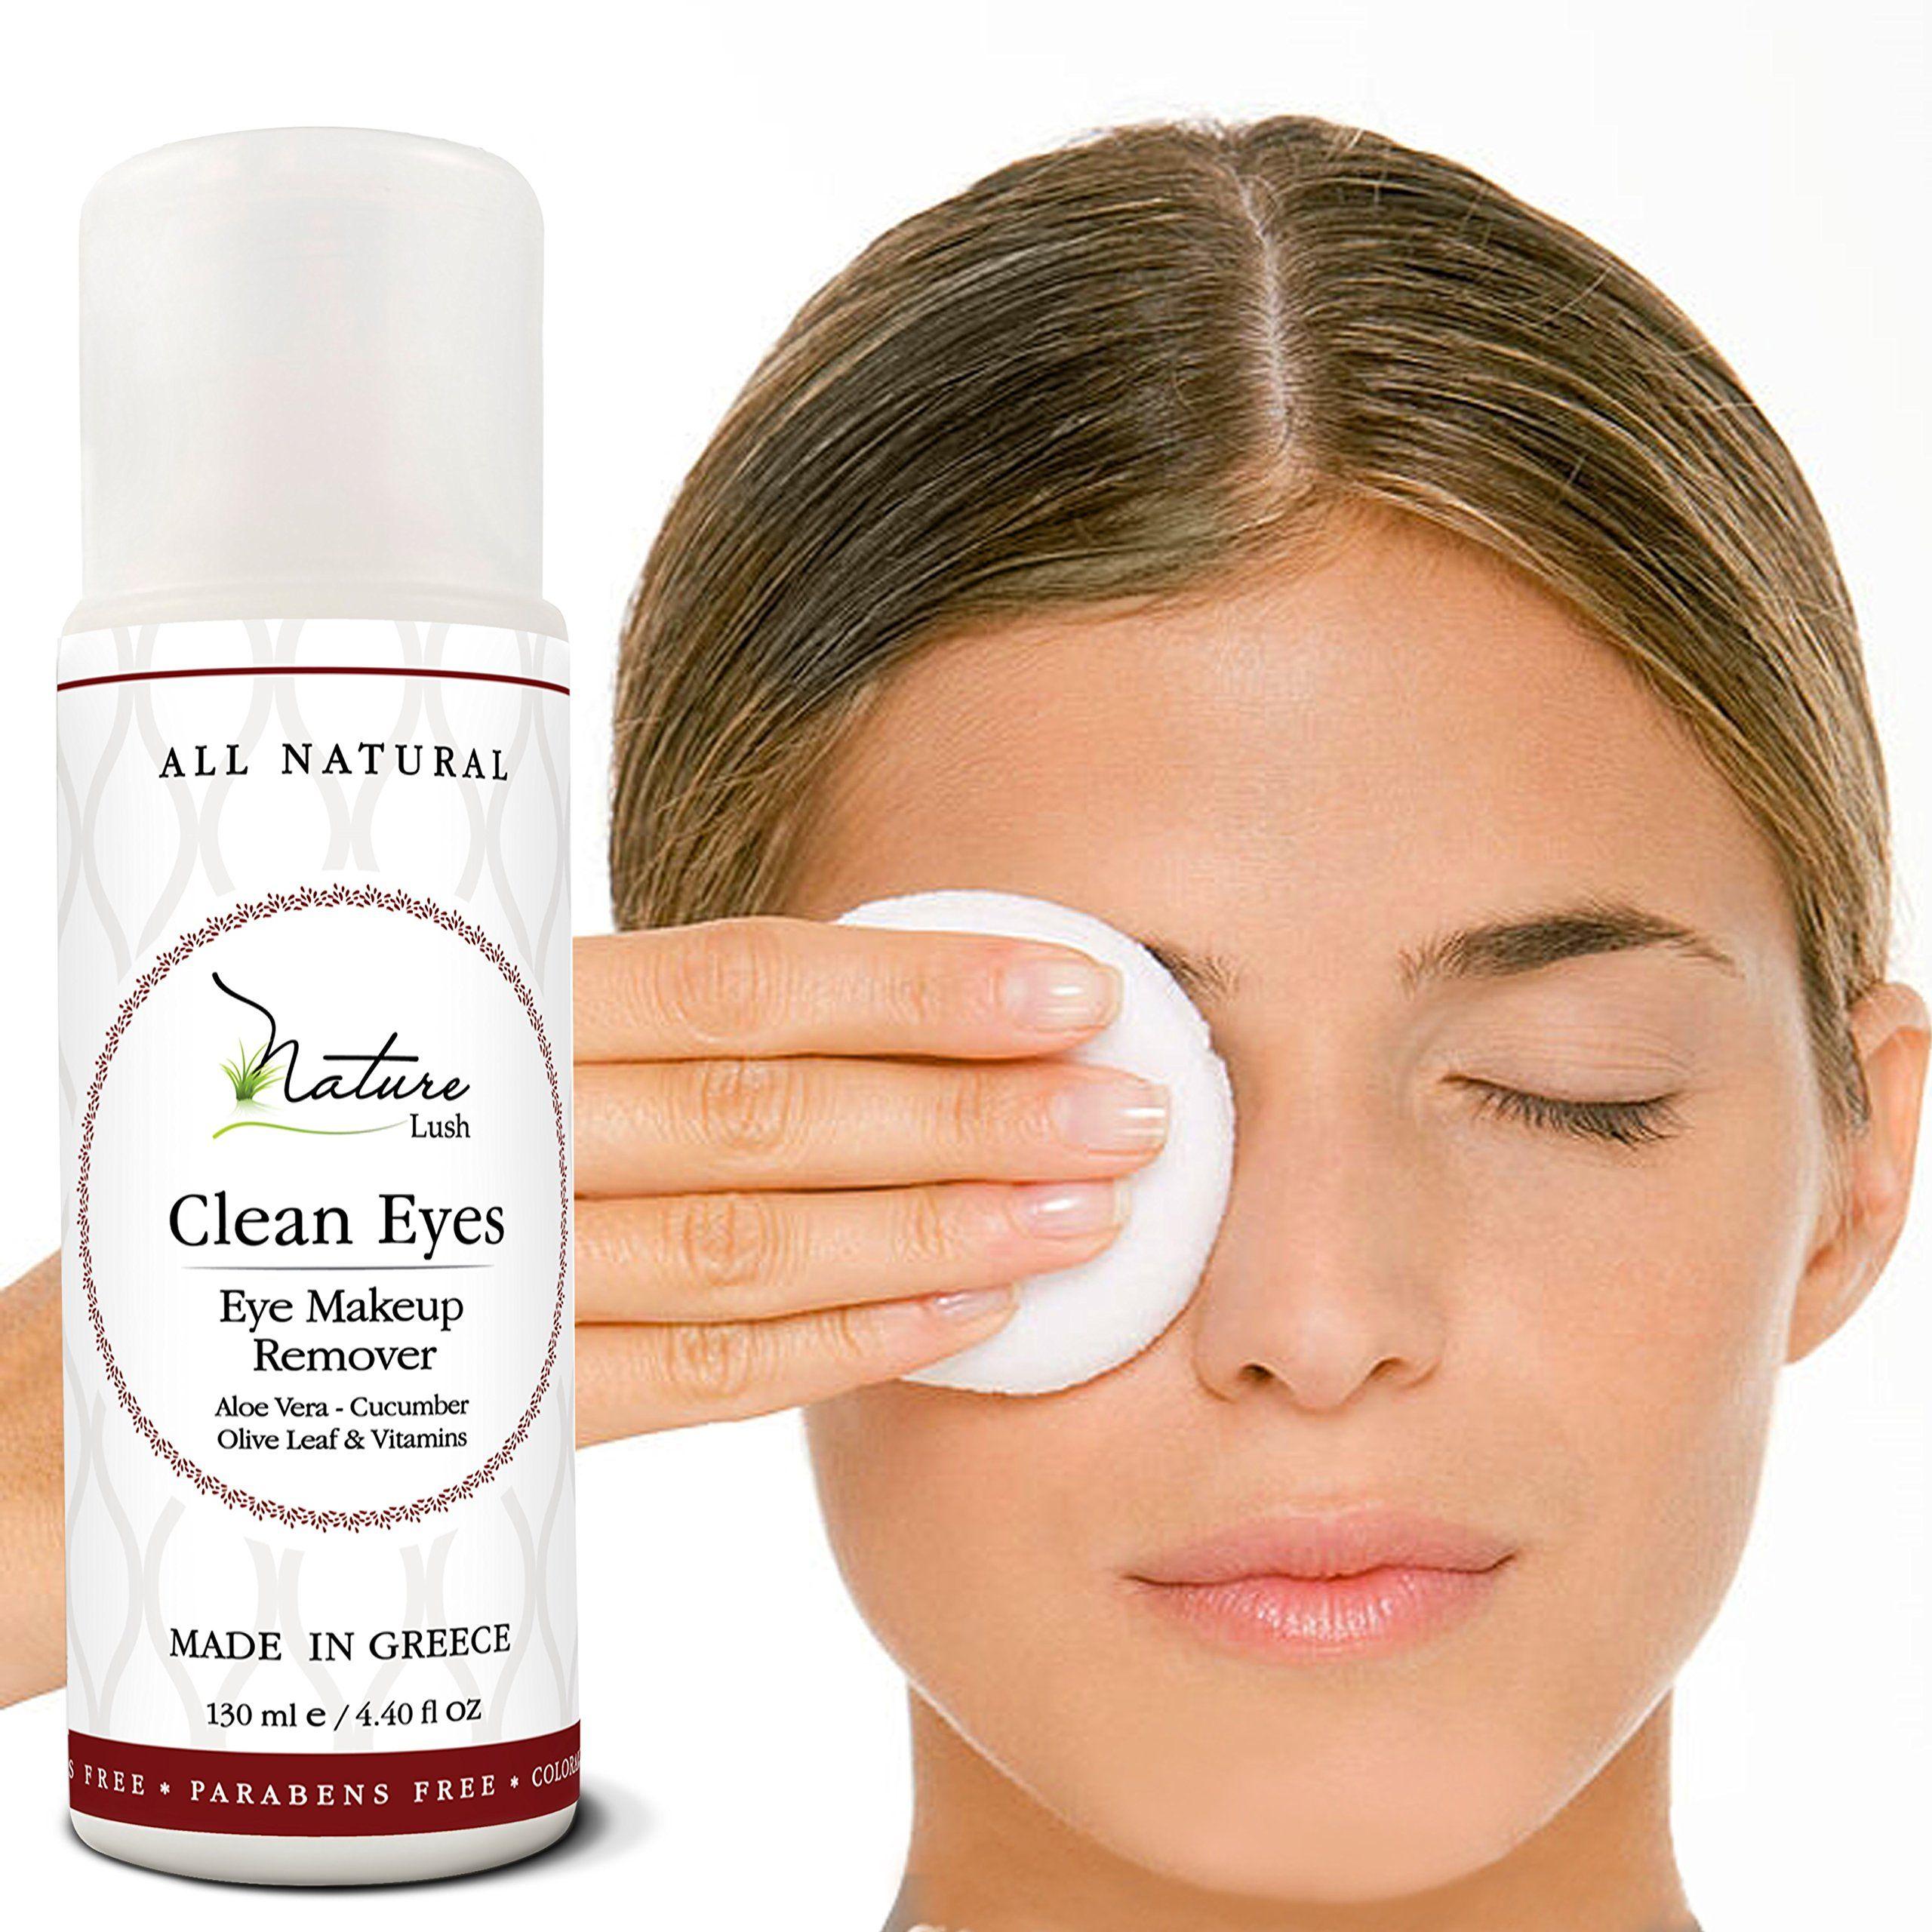 The Best Natural Eye EyeMakeupRemover Eye makeup